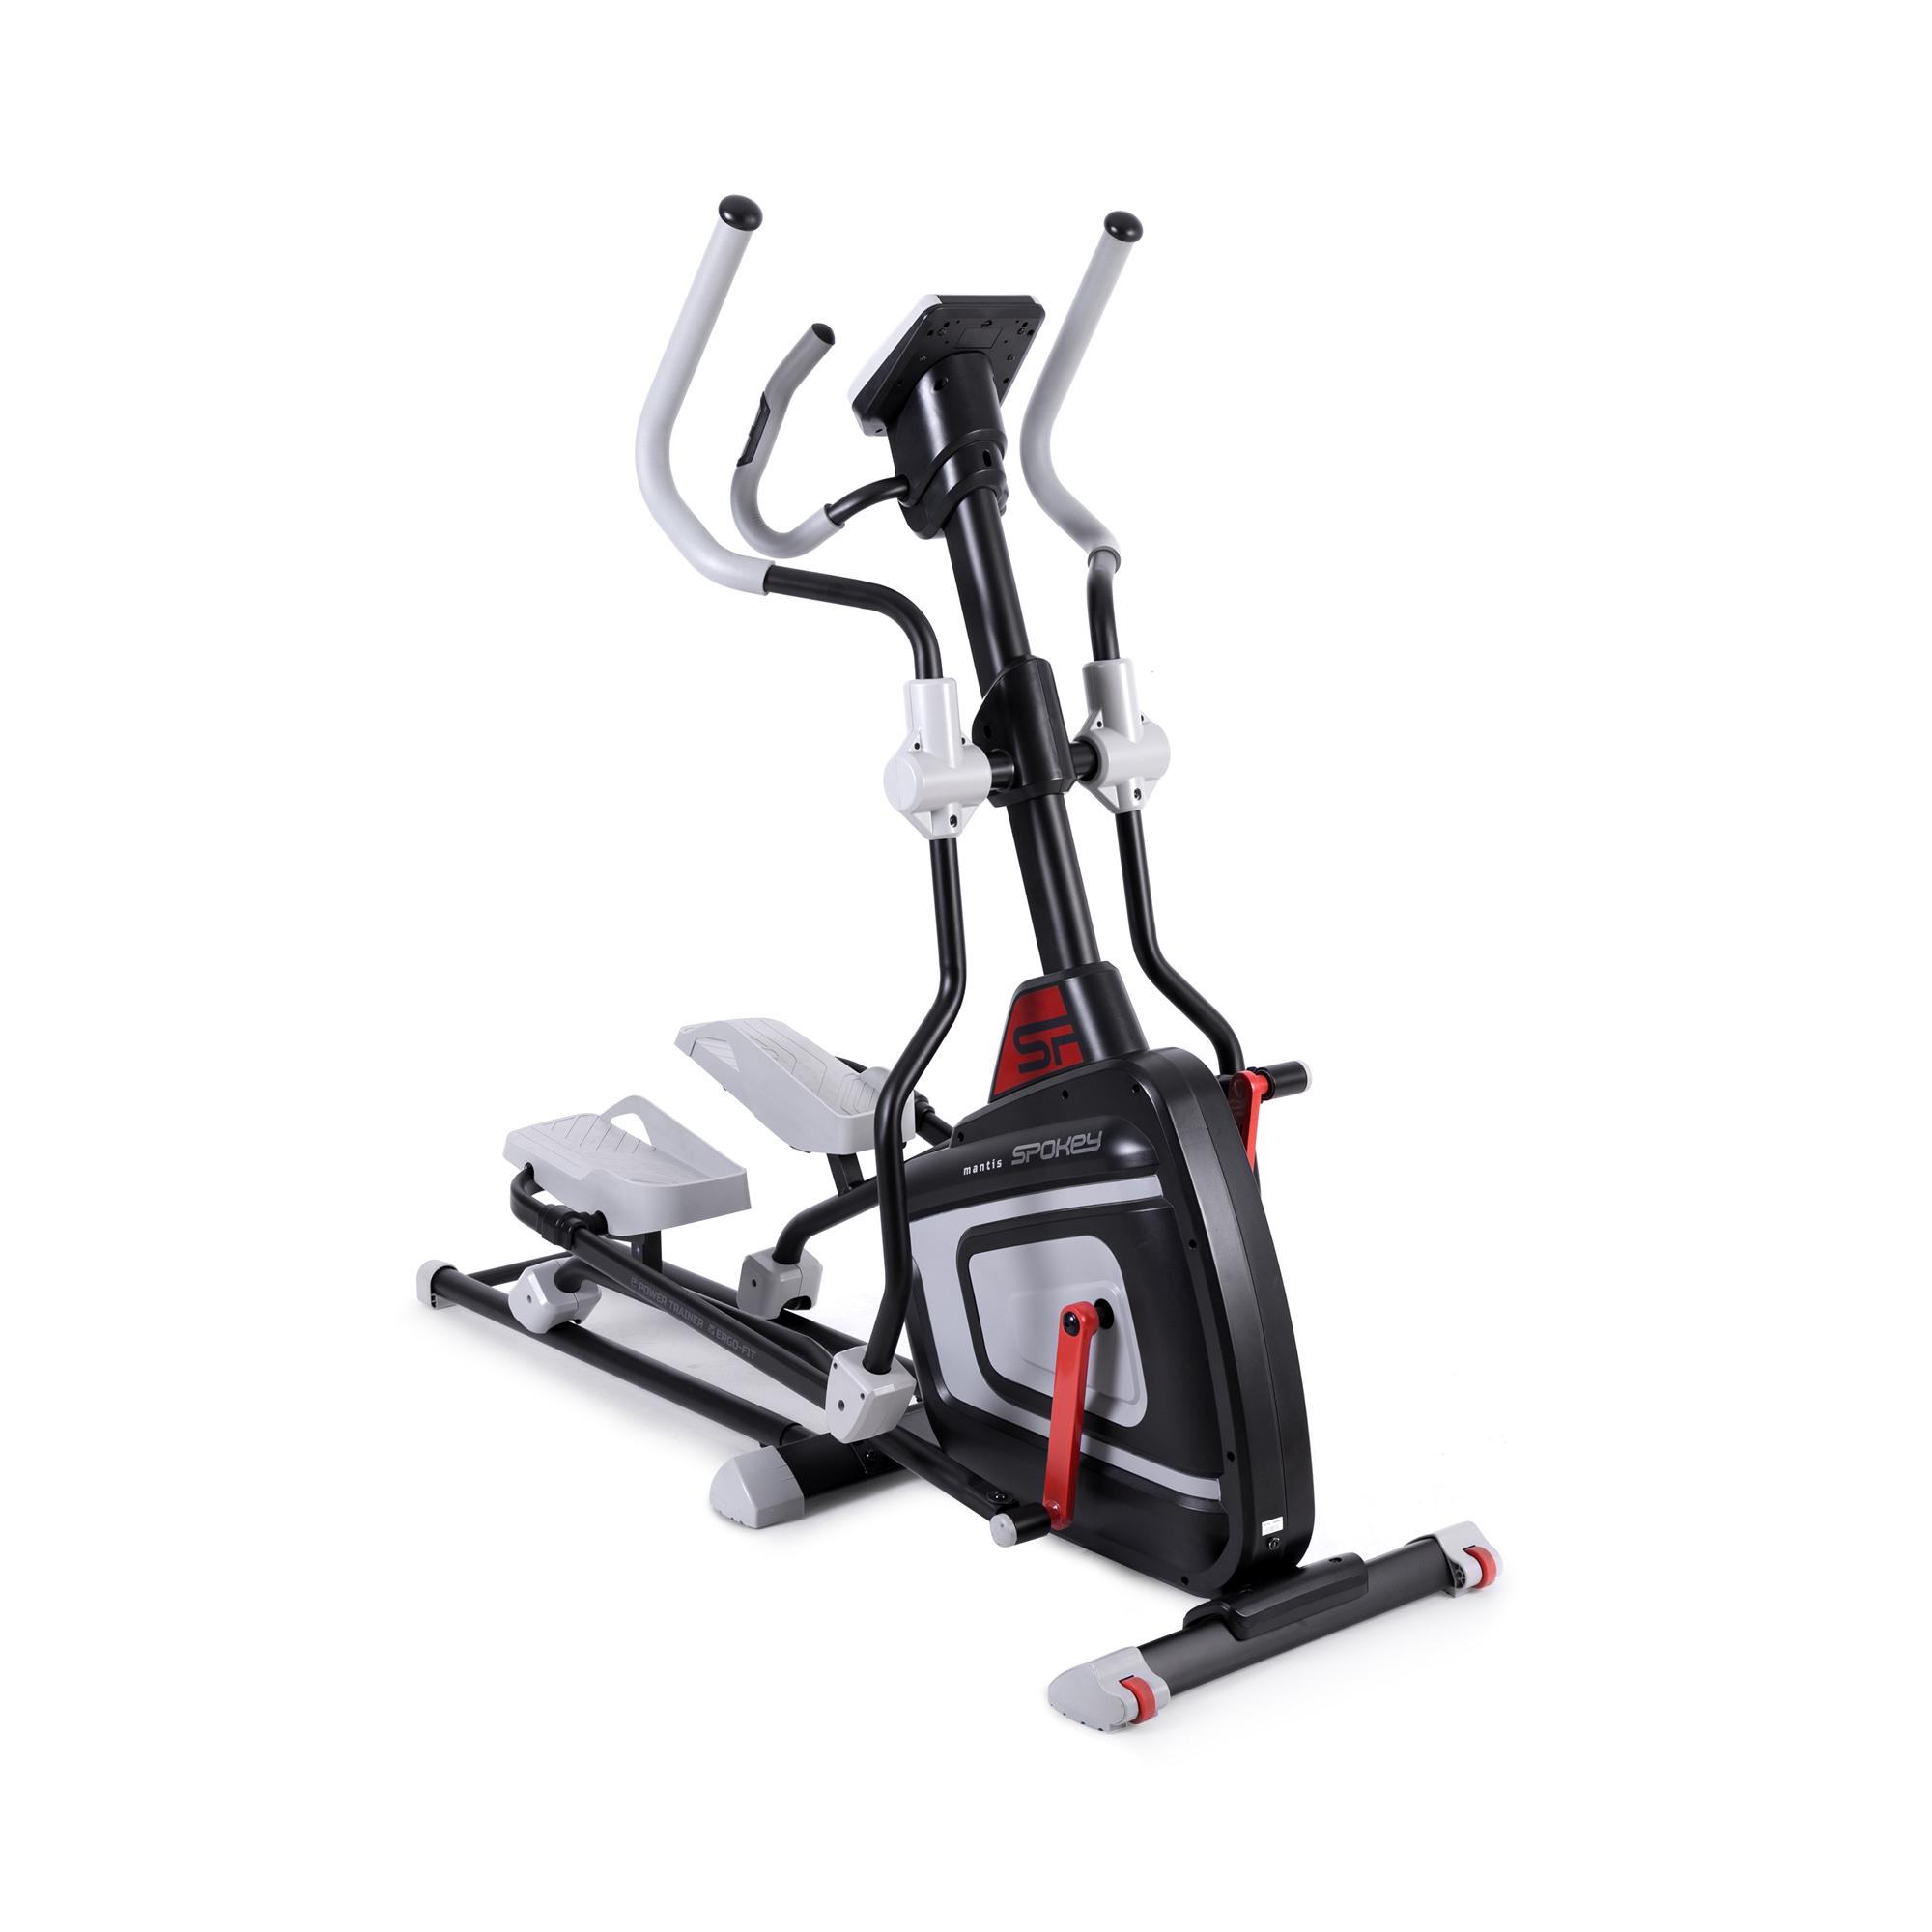 Elliptical Bike Definition: Elliptical Trainer MANTIS